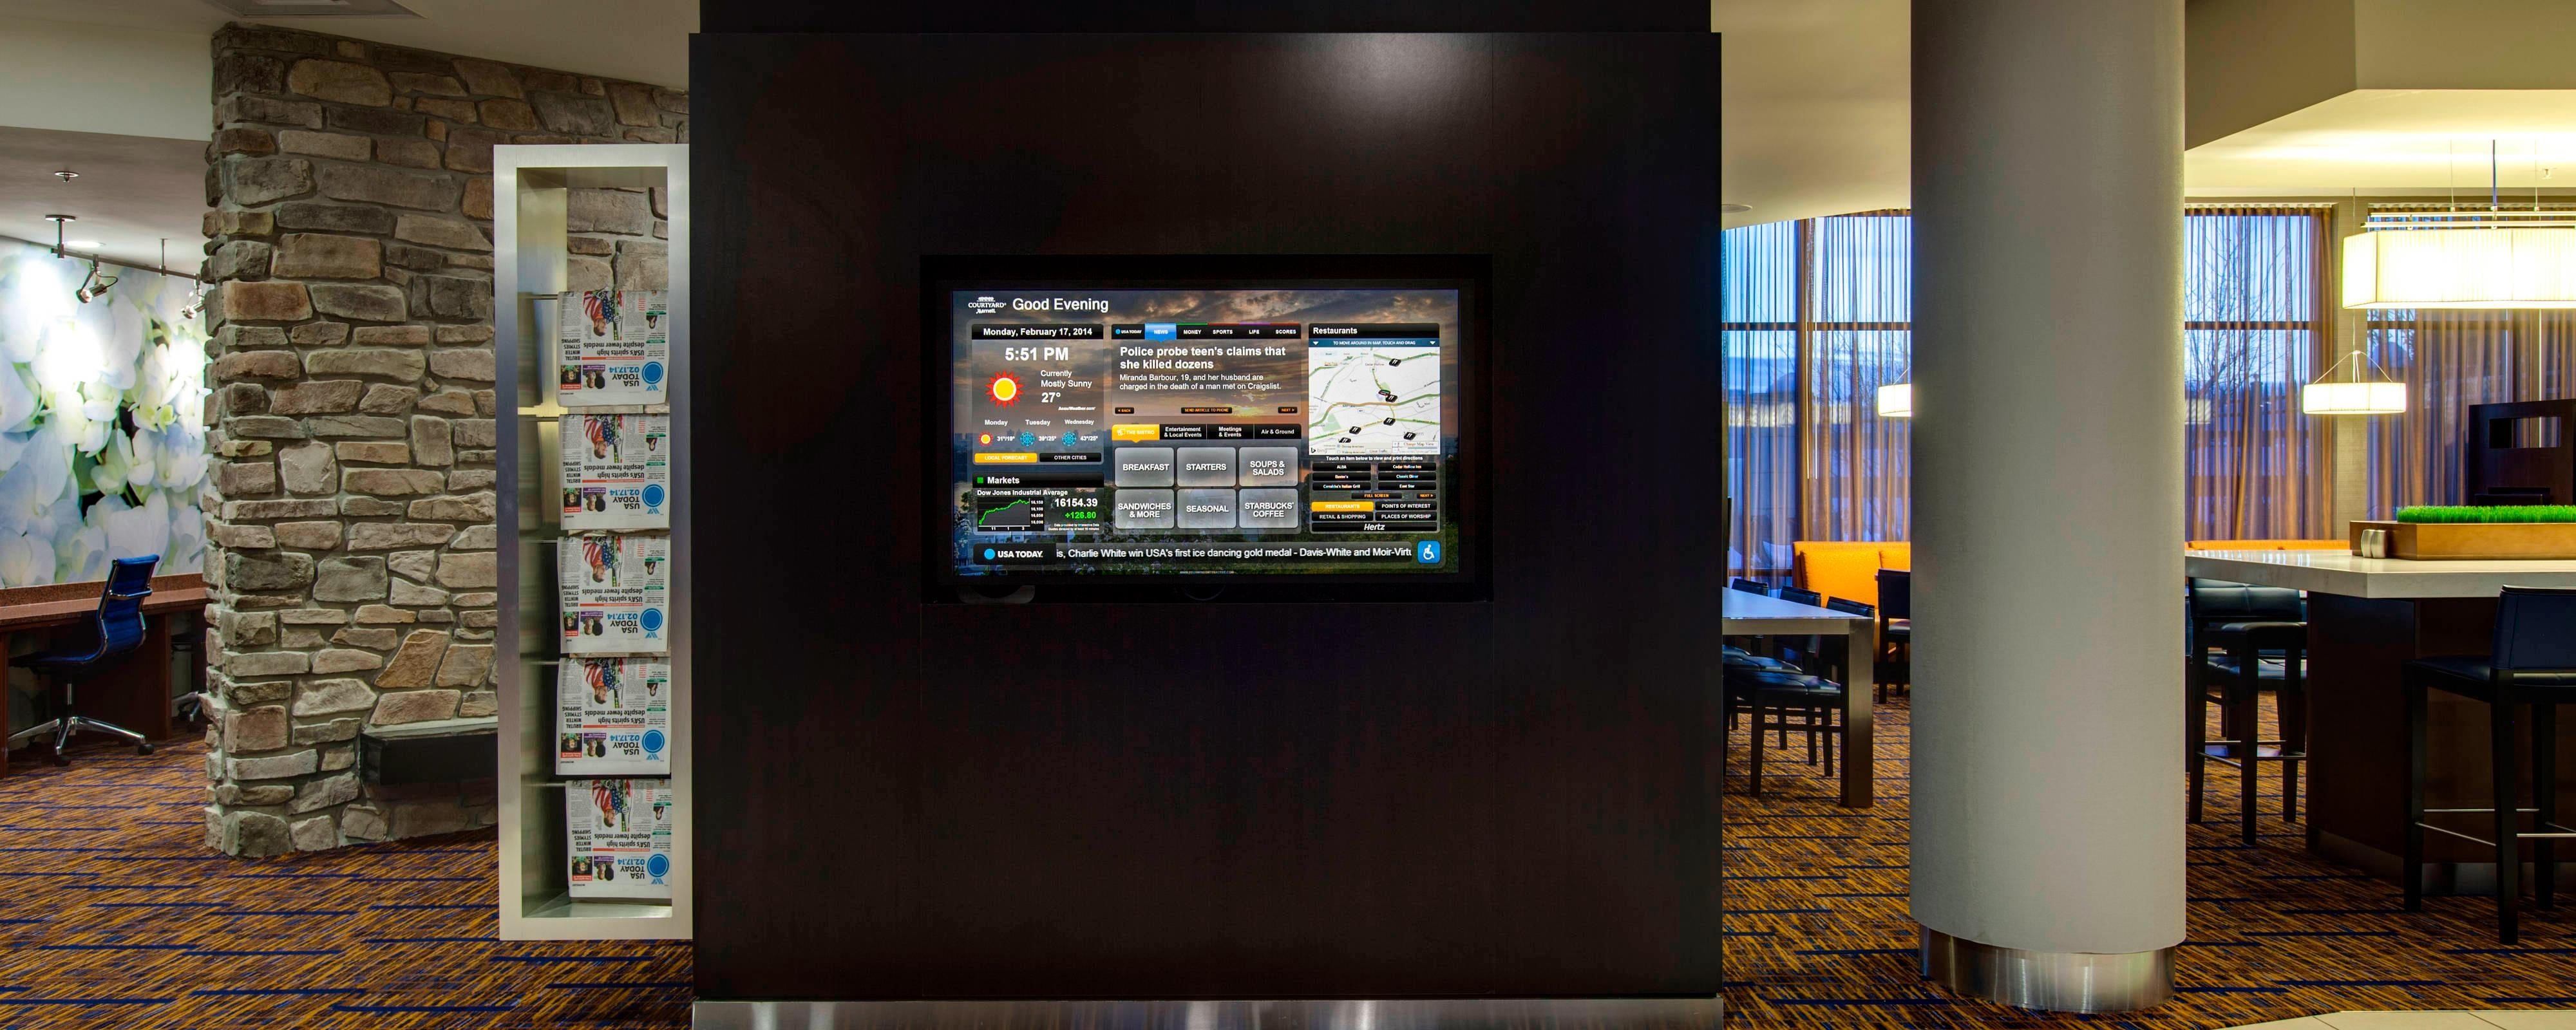 Malvern PA Hotel Lobby